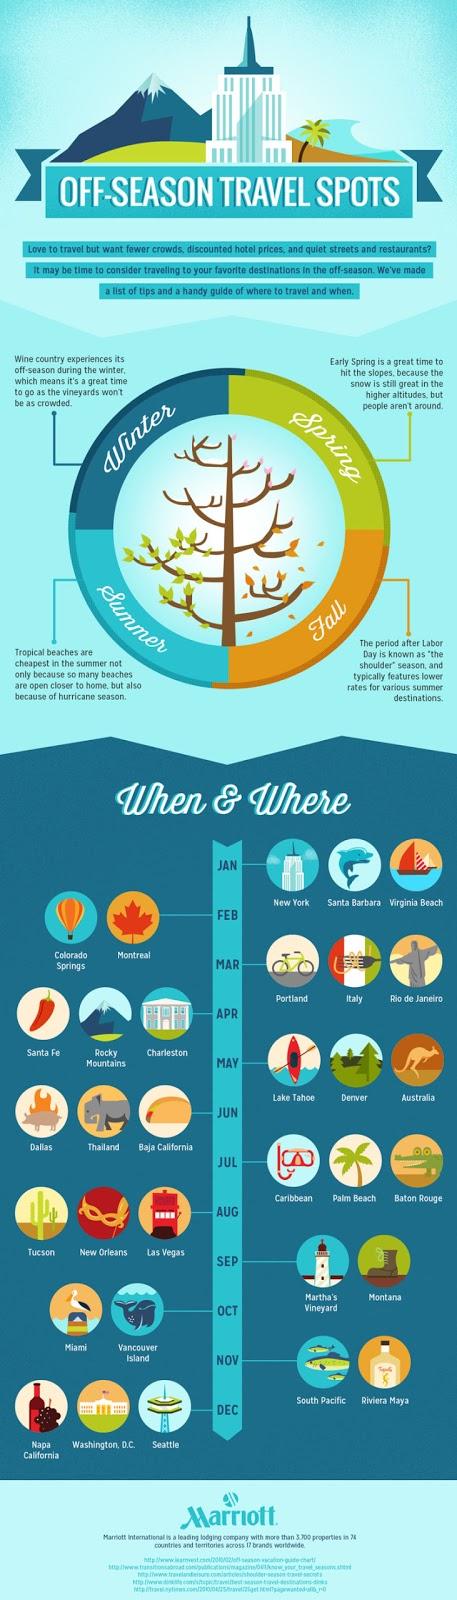 off season travel infographic